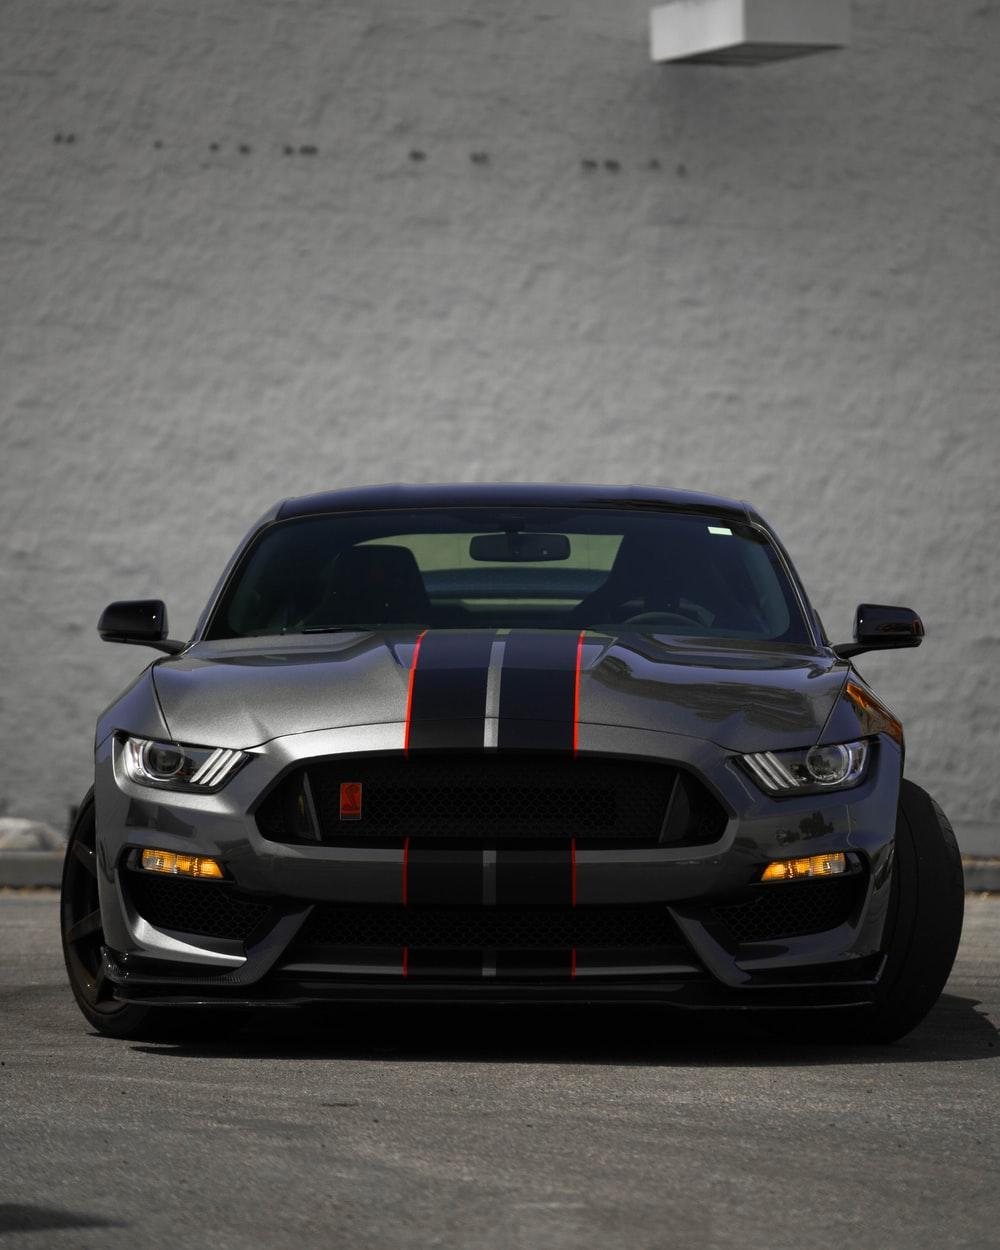 Mustang Wallpapers HD Download [500 HQ] Unsplash 1000x1250